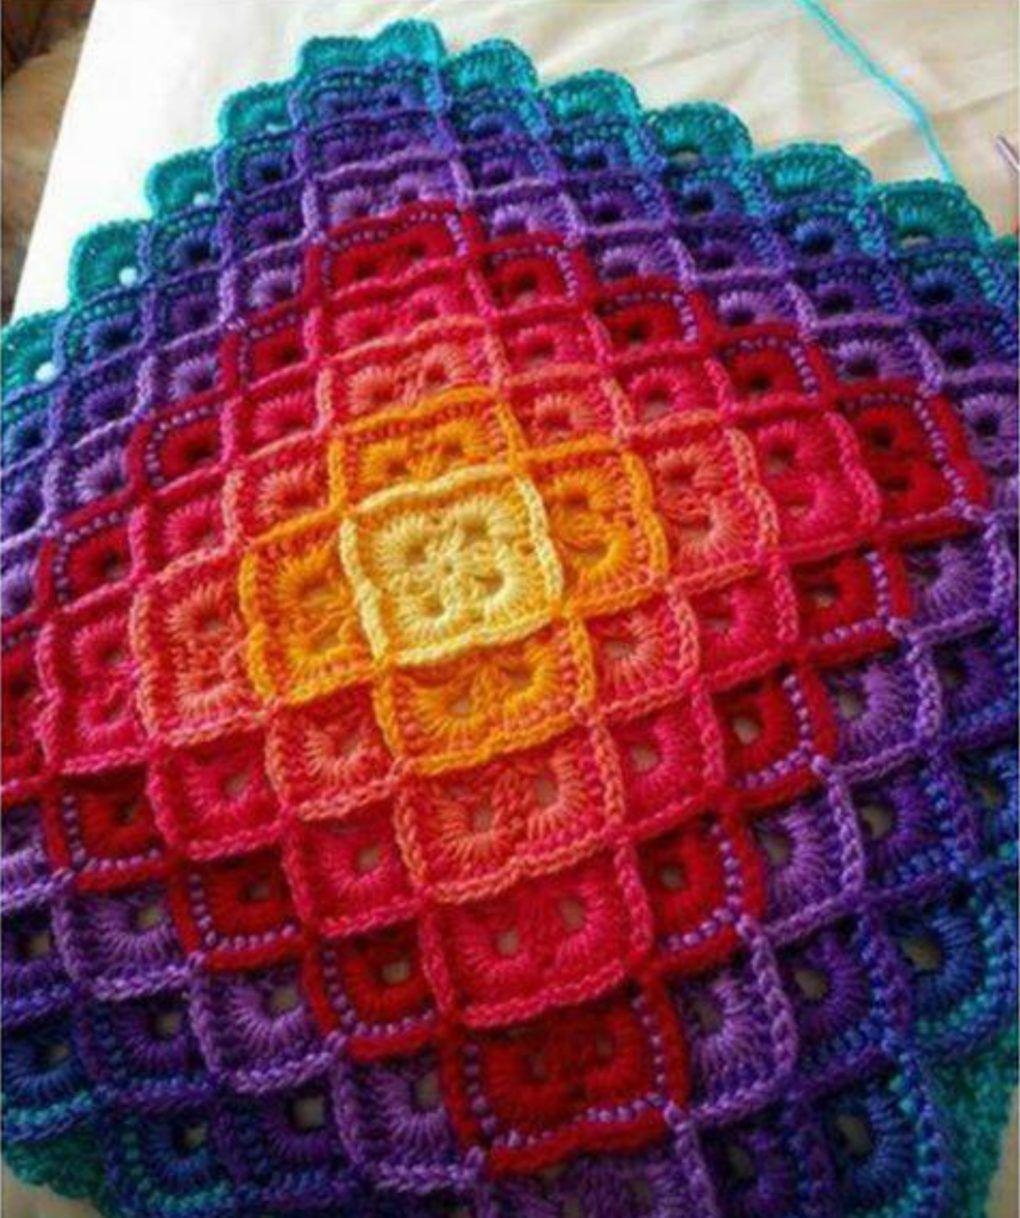 Shells Blanket Tutorial + Free Pattern | afhgans | Pinterest ...